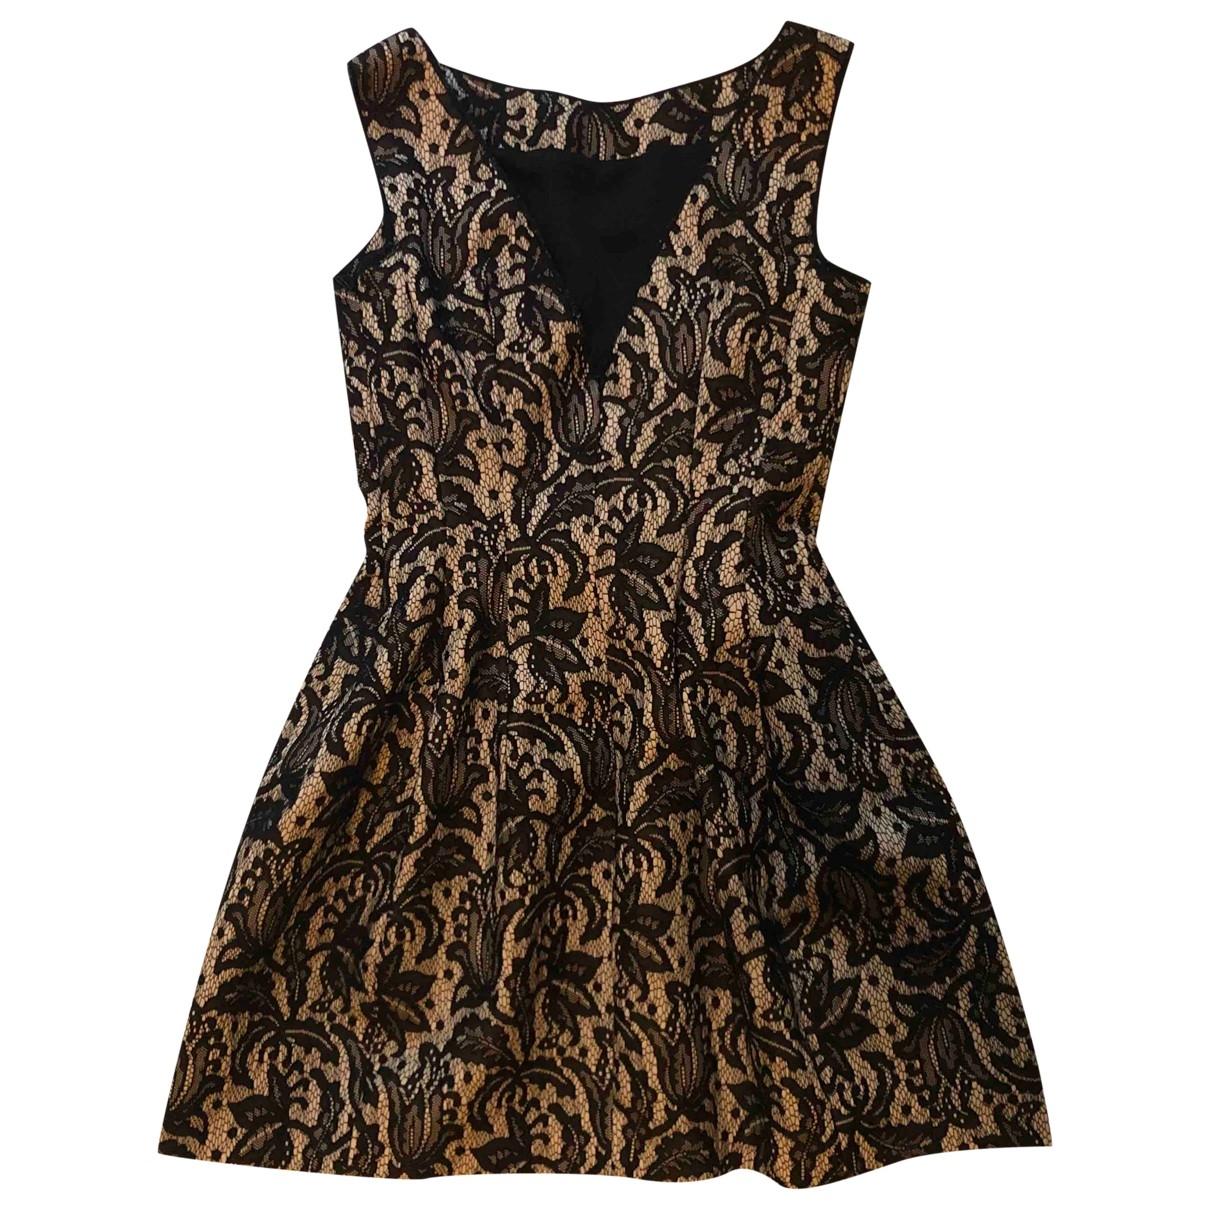 Zara \N Kleid in  Beige Polyester